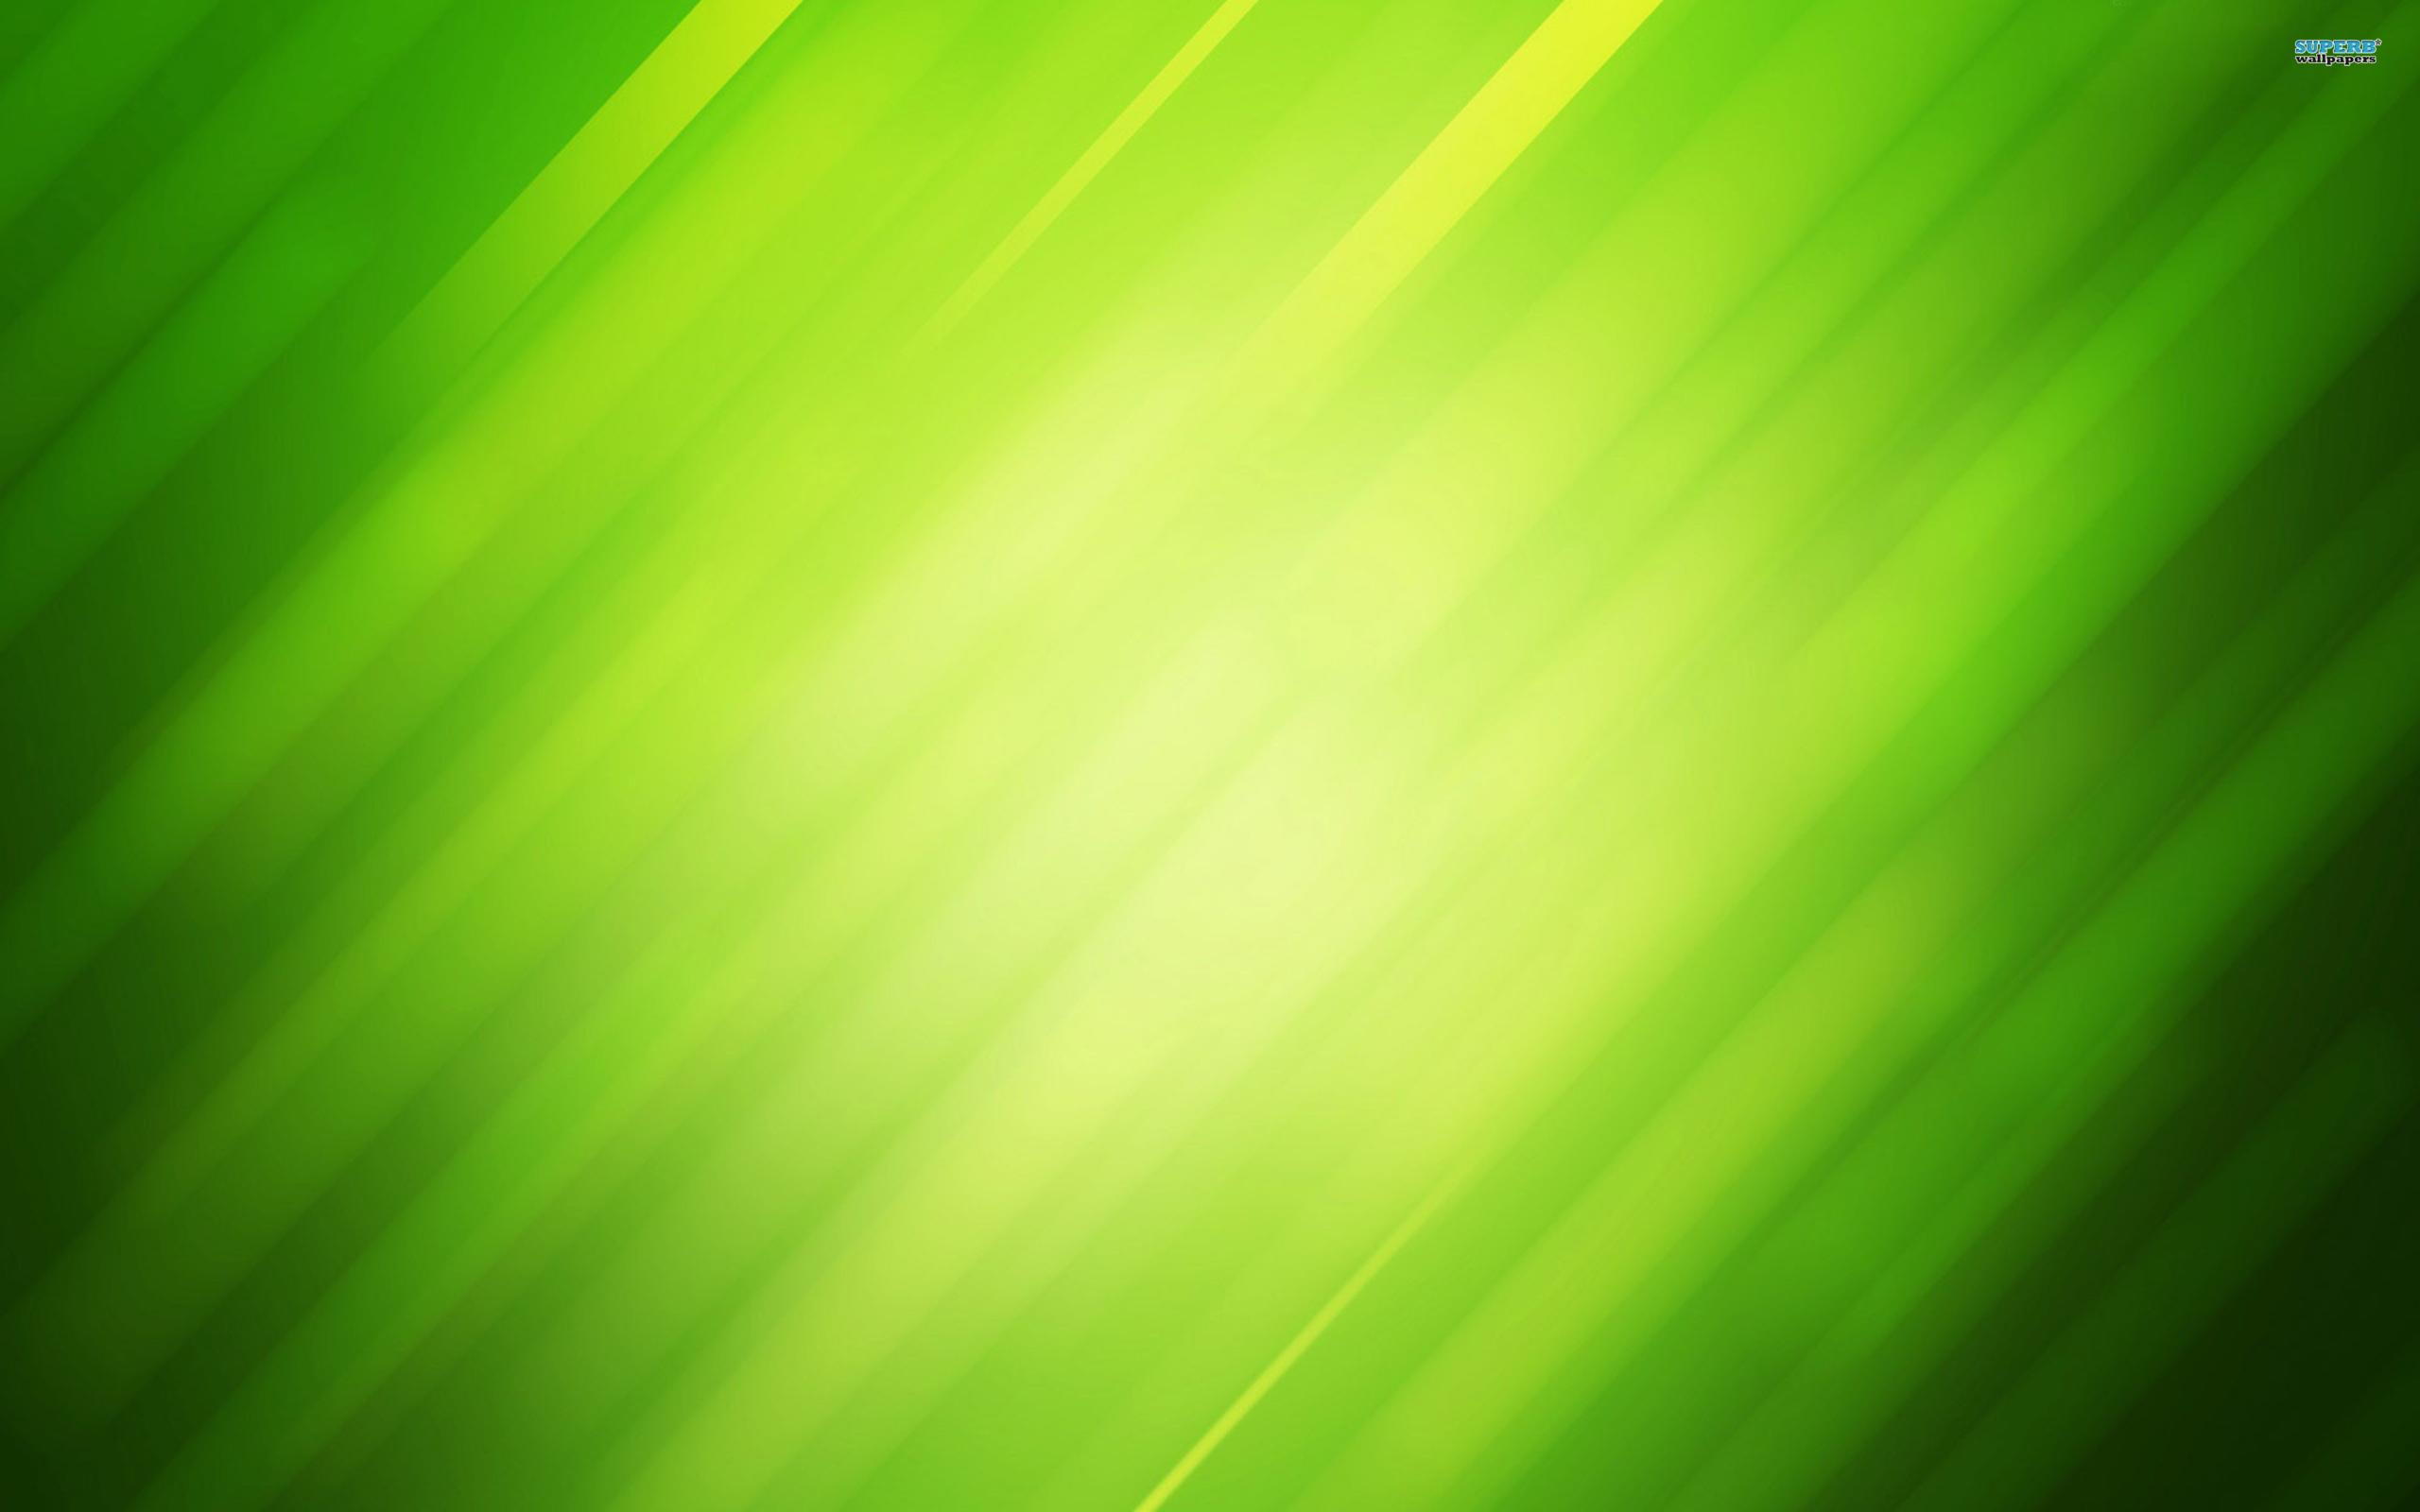 Abstract Green Rays 406756 Wallpaper wallpaper